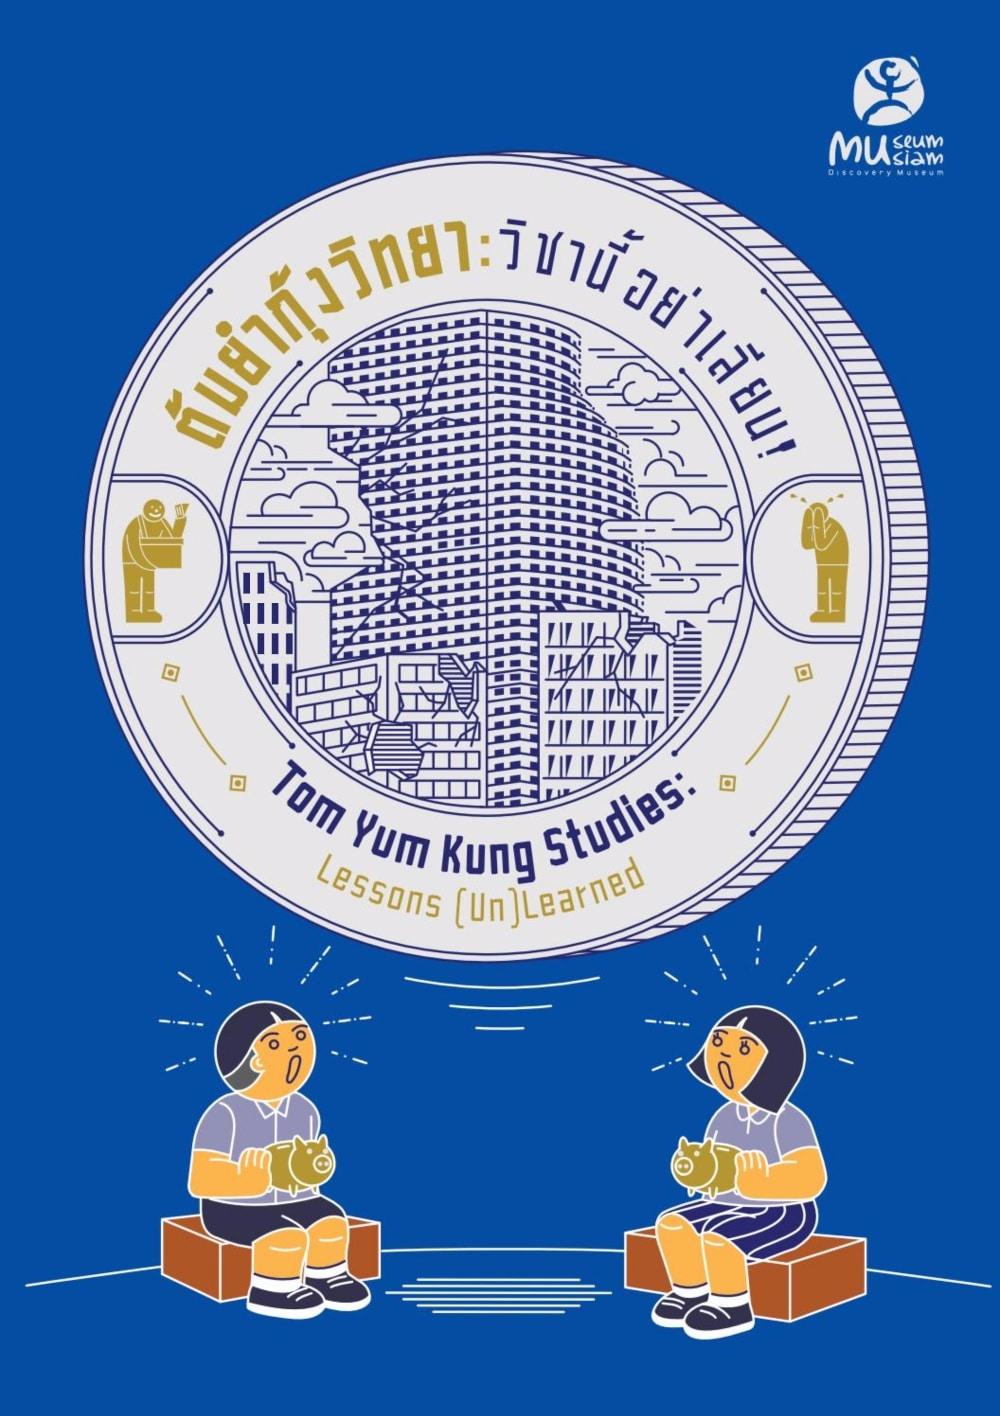 tom-yam-kung-studies-18